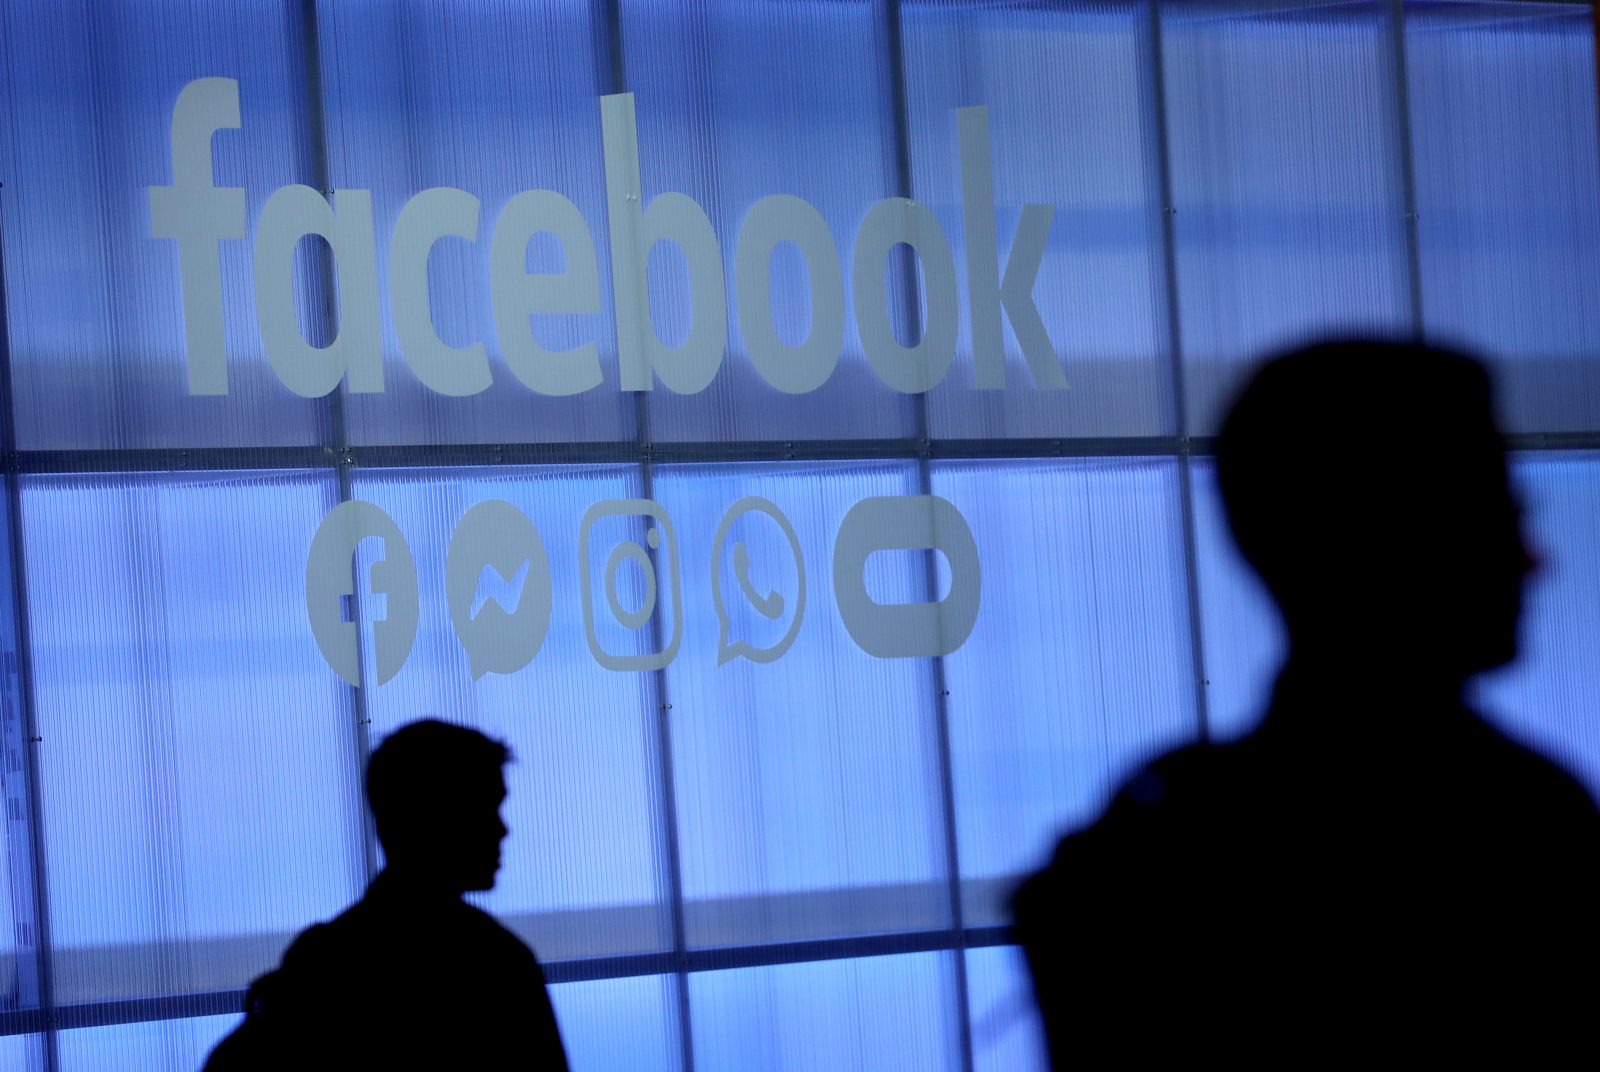 Facebook sued over Cambridge Analytica data scandal - CityAM